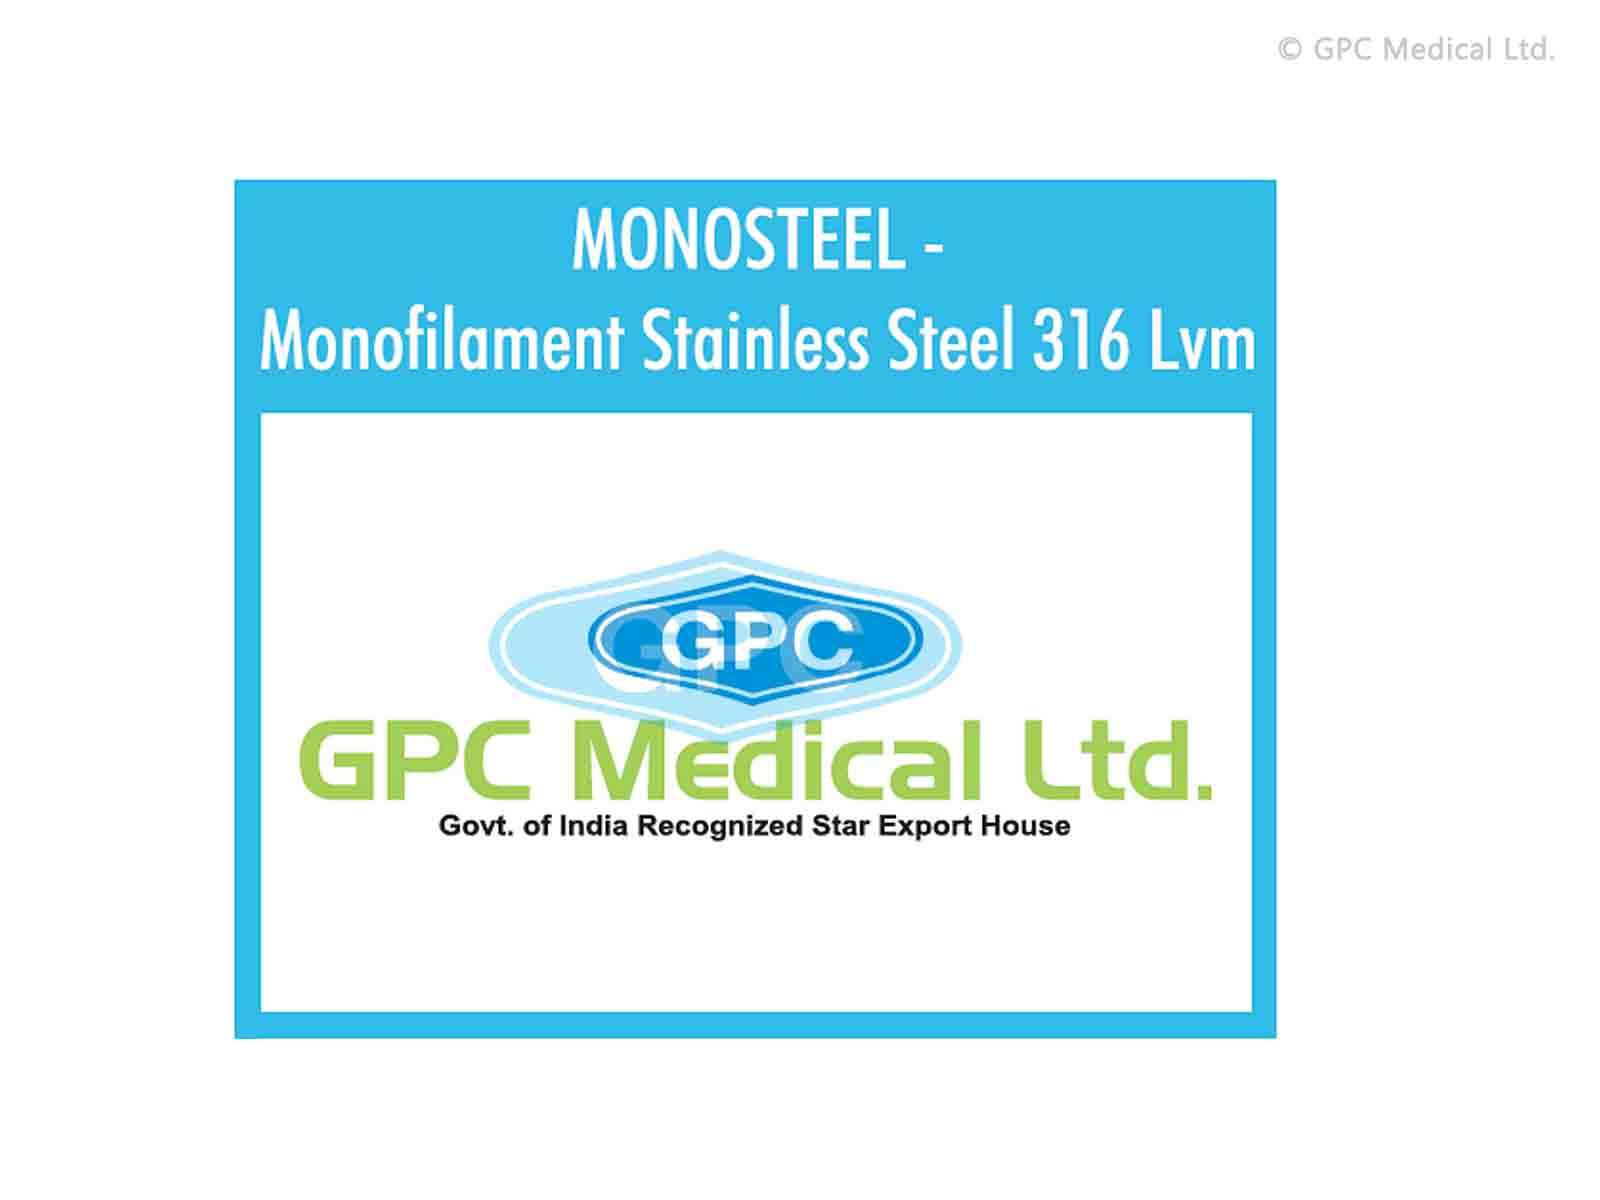 GPCMONOSTEEL - Monofilament Stainless Steel 316 Lvm